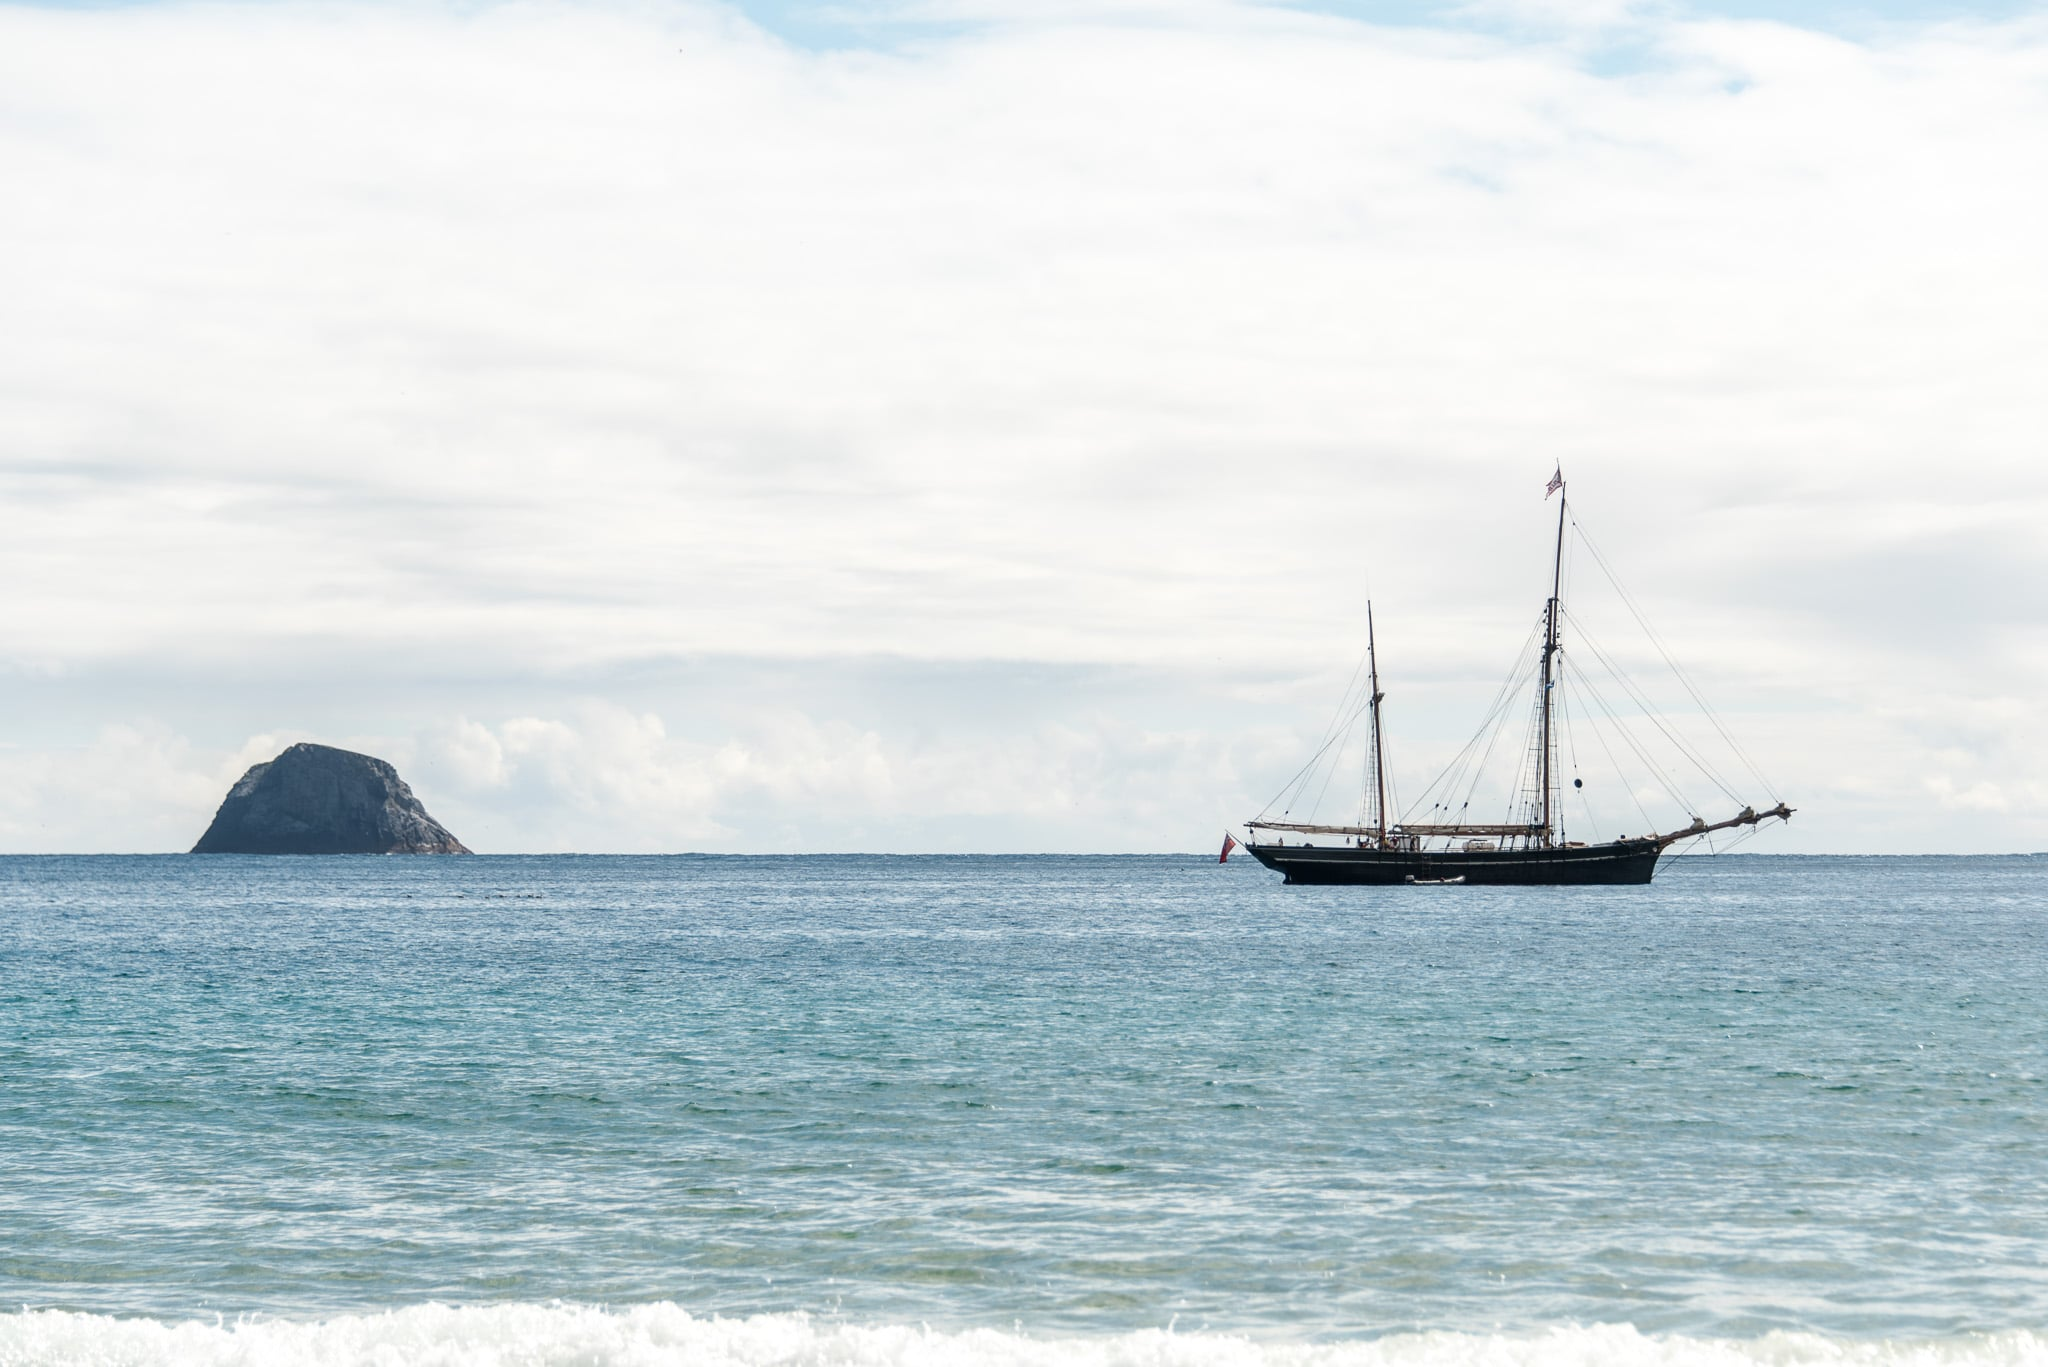 anchored off scotland